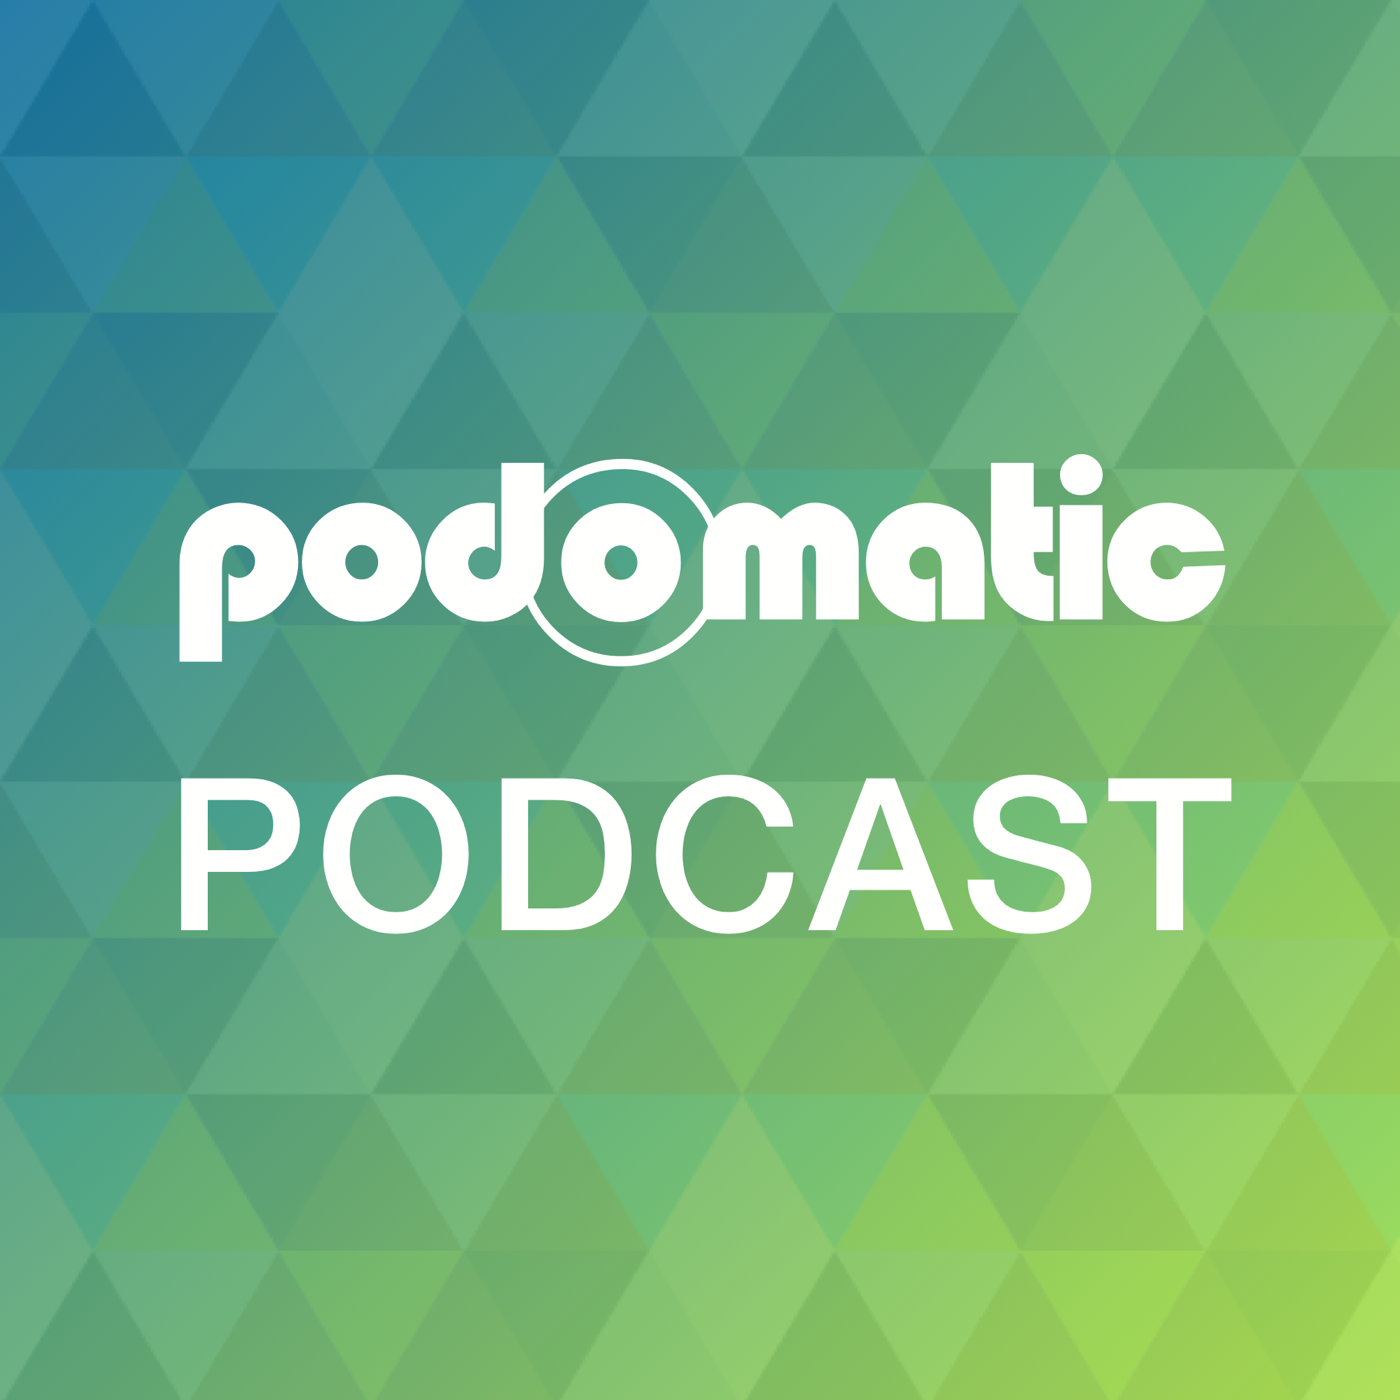 Lighthouse Tabernacle of C.I. Sermon Podcast